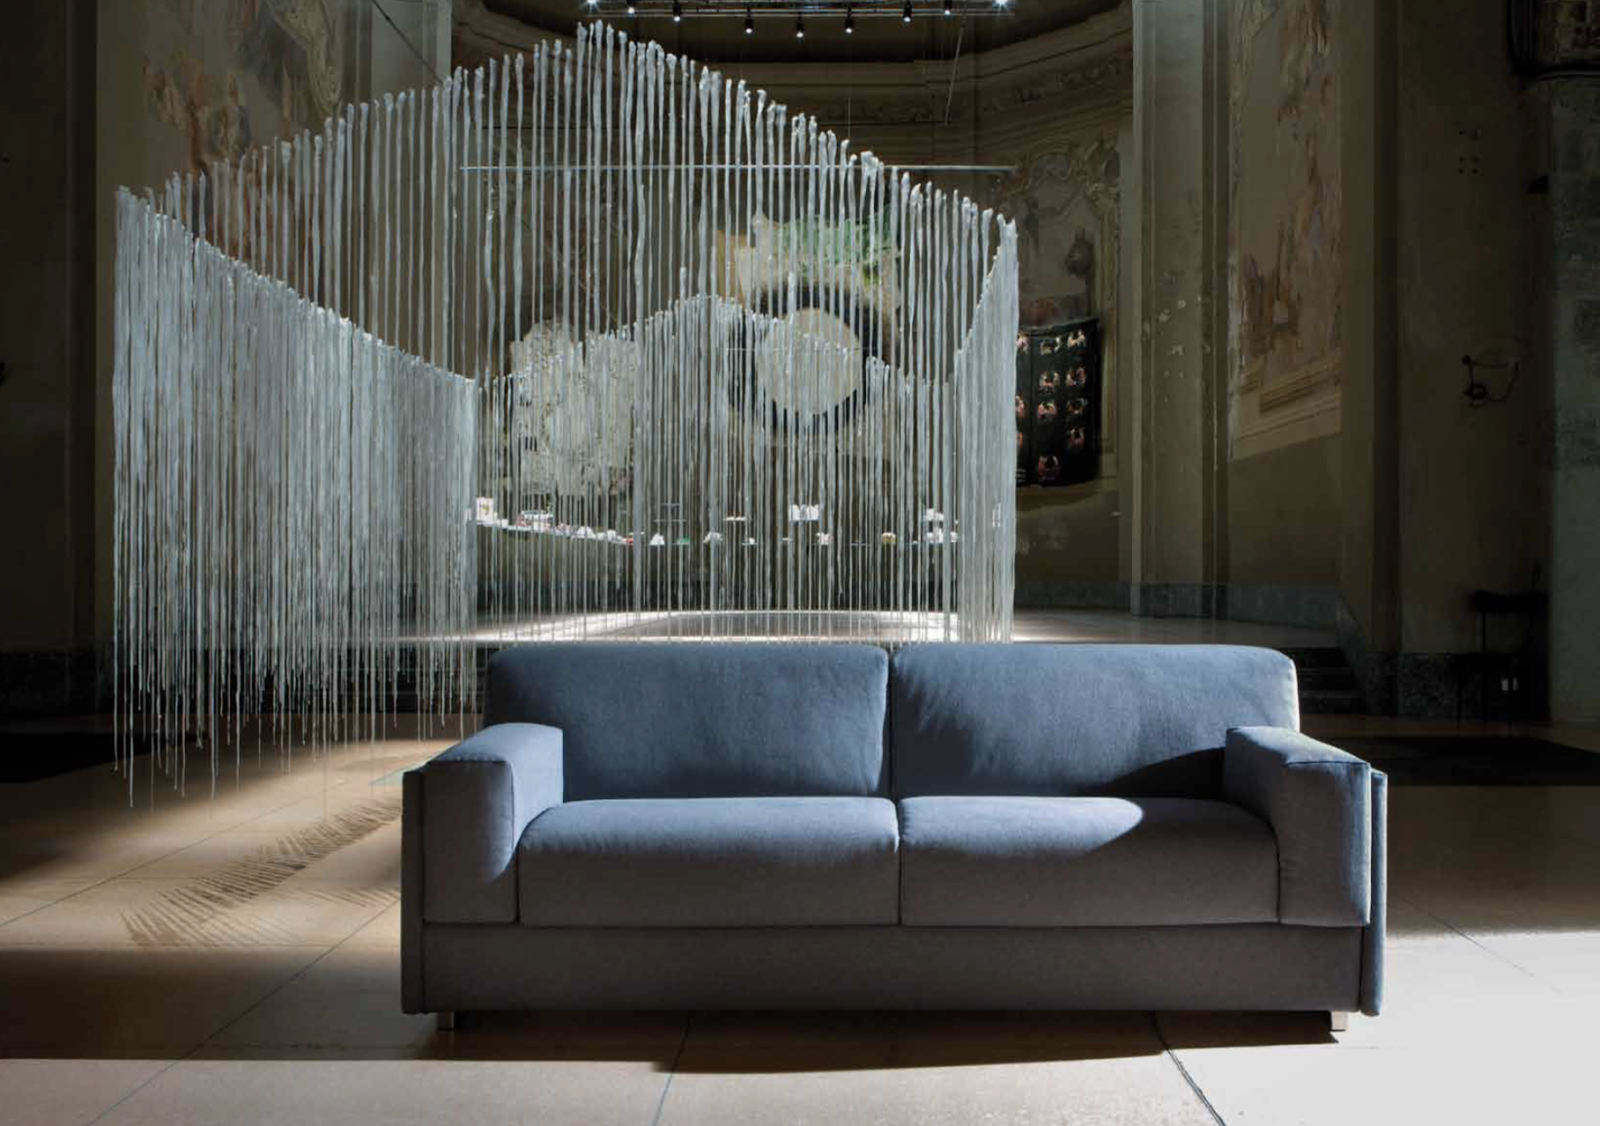 Latest Italian Sofa Designs Nicolo Leather Reclining Sectional Momentoitalia Furniture Blog New Modern